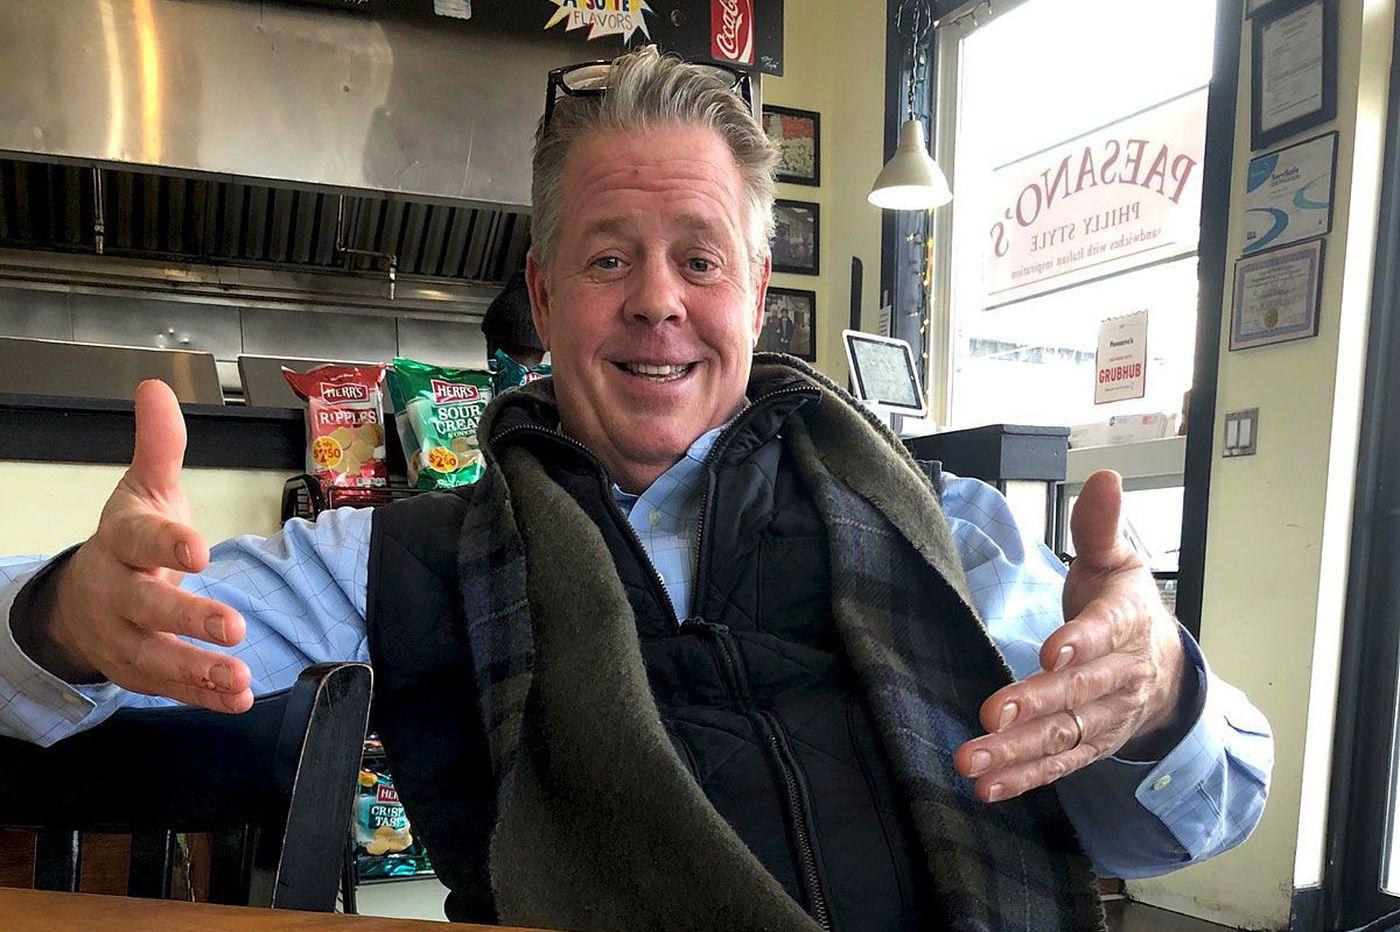 Modo Mio, chef Peter McAndrews' Italian restaurant, to come back